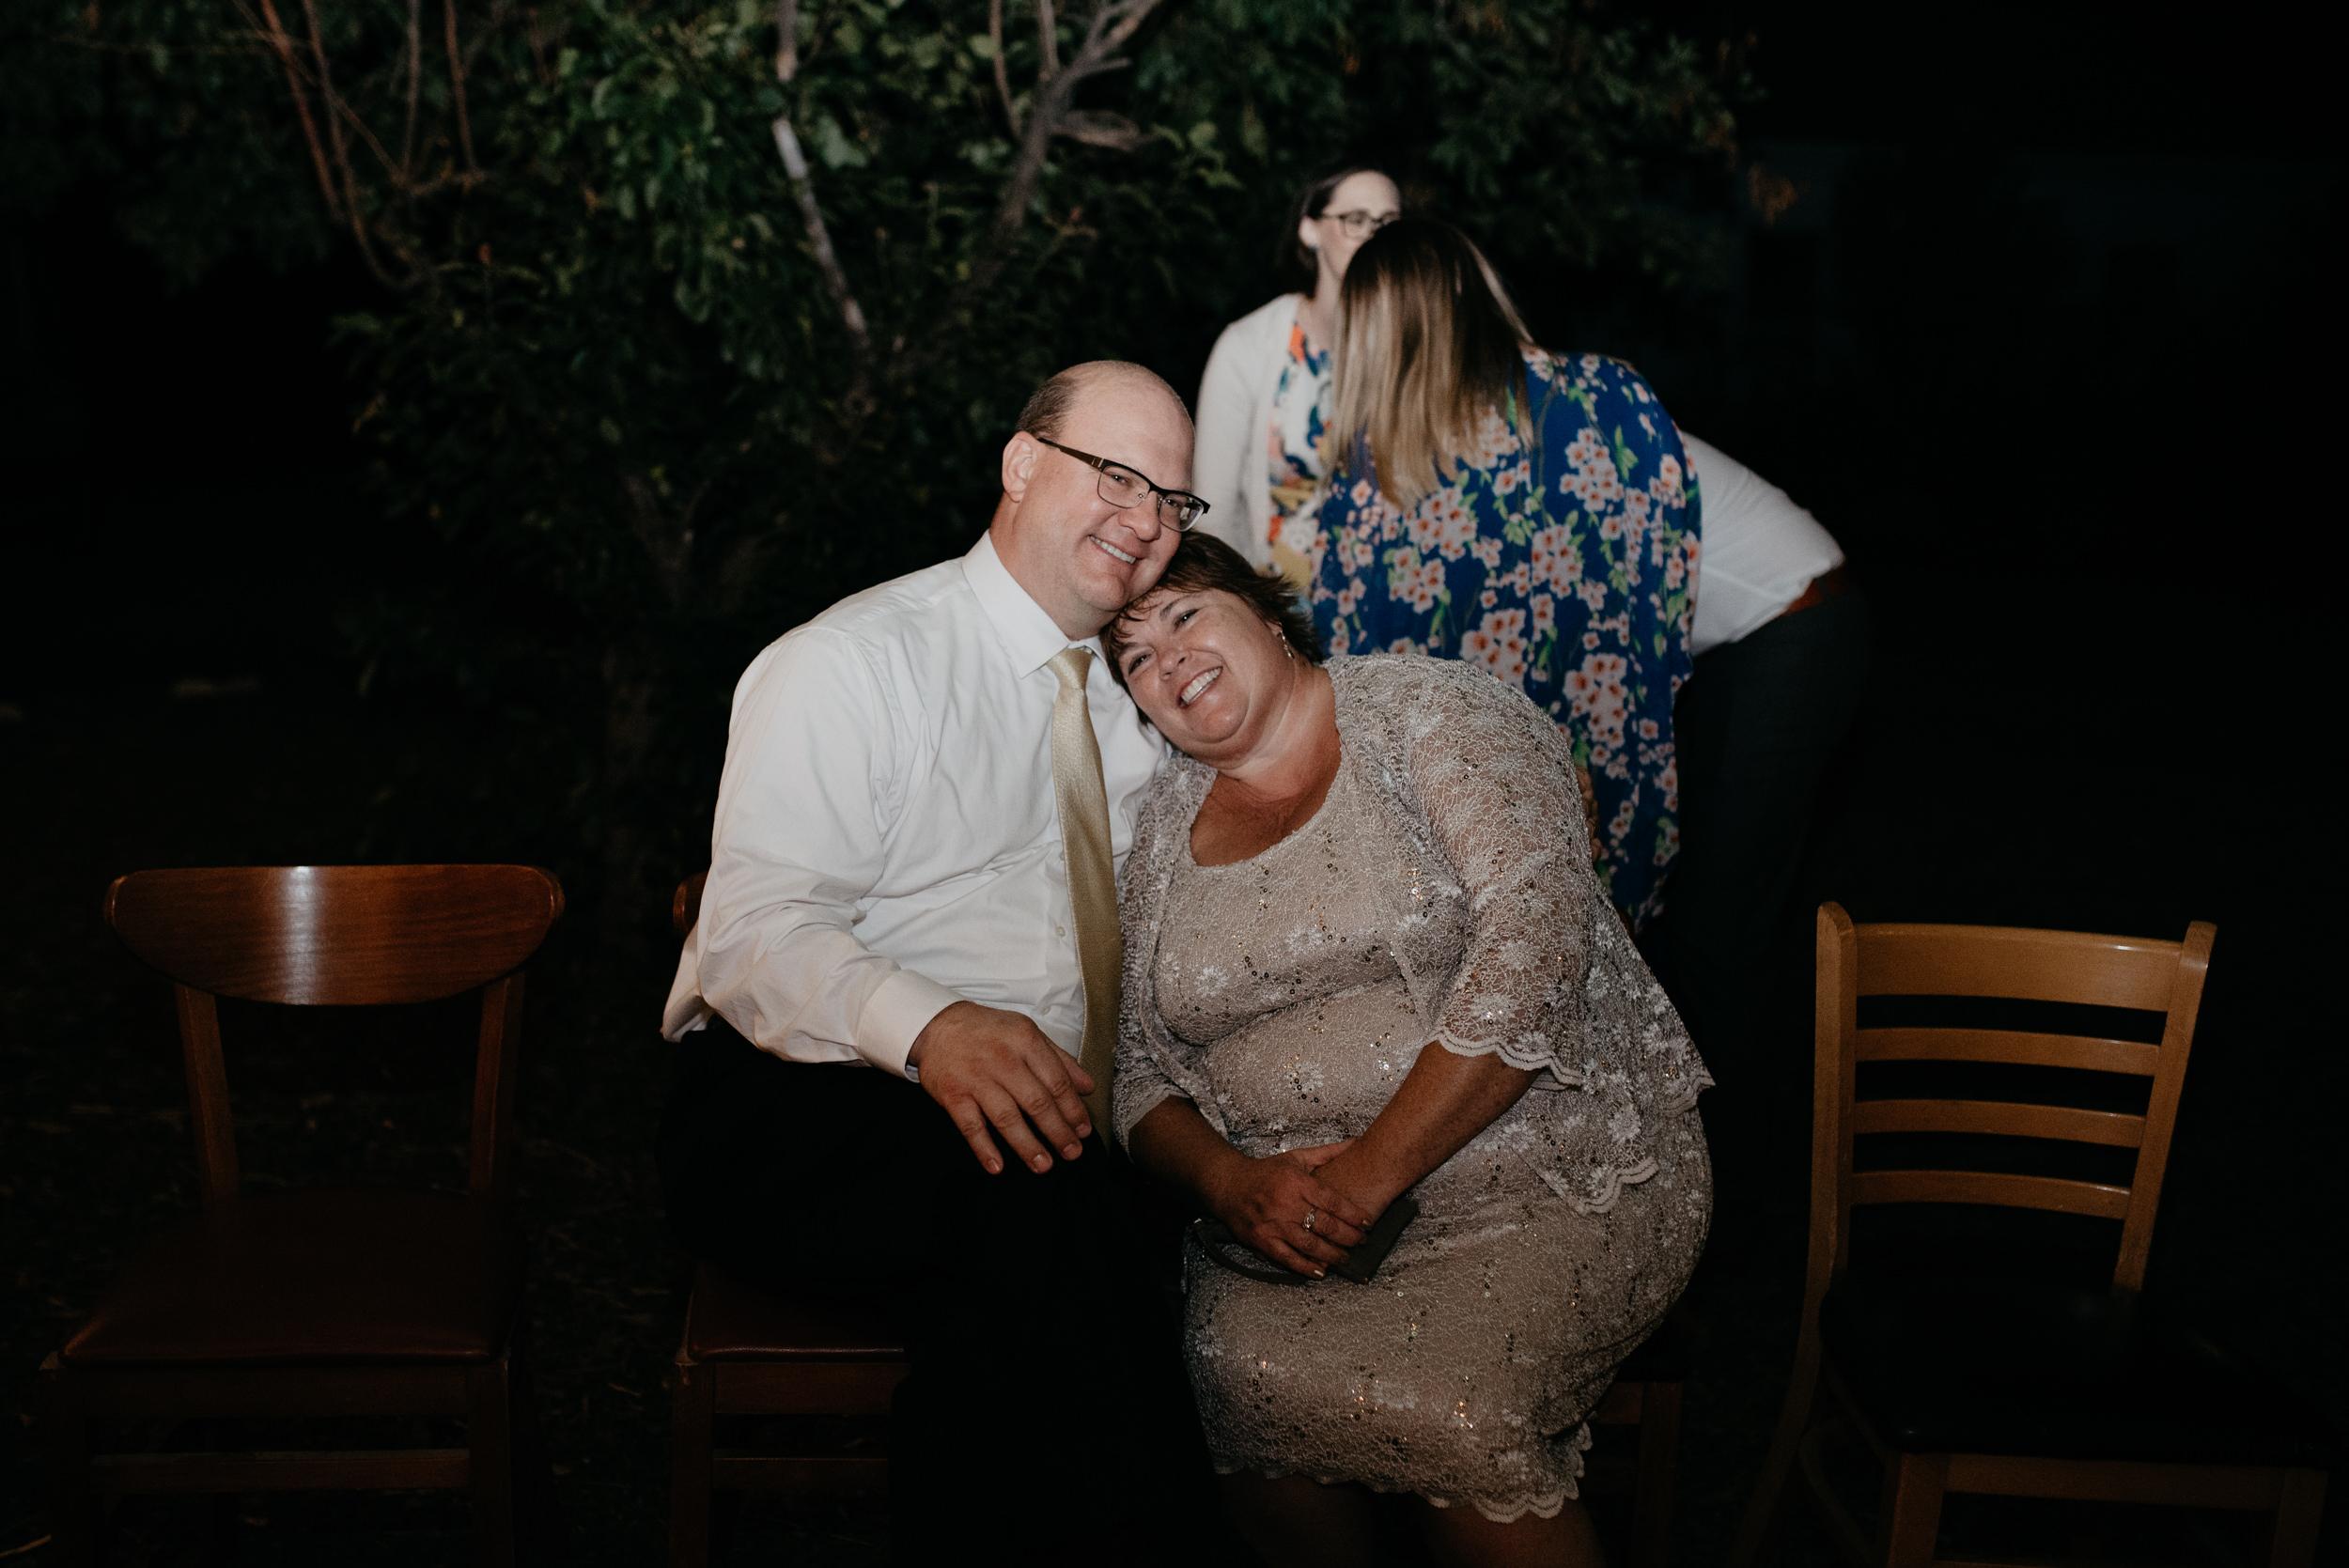 Brides parents at wedding reception. Boulder, Colorado wedding photographer.